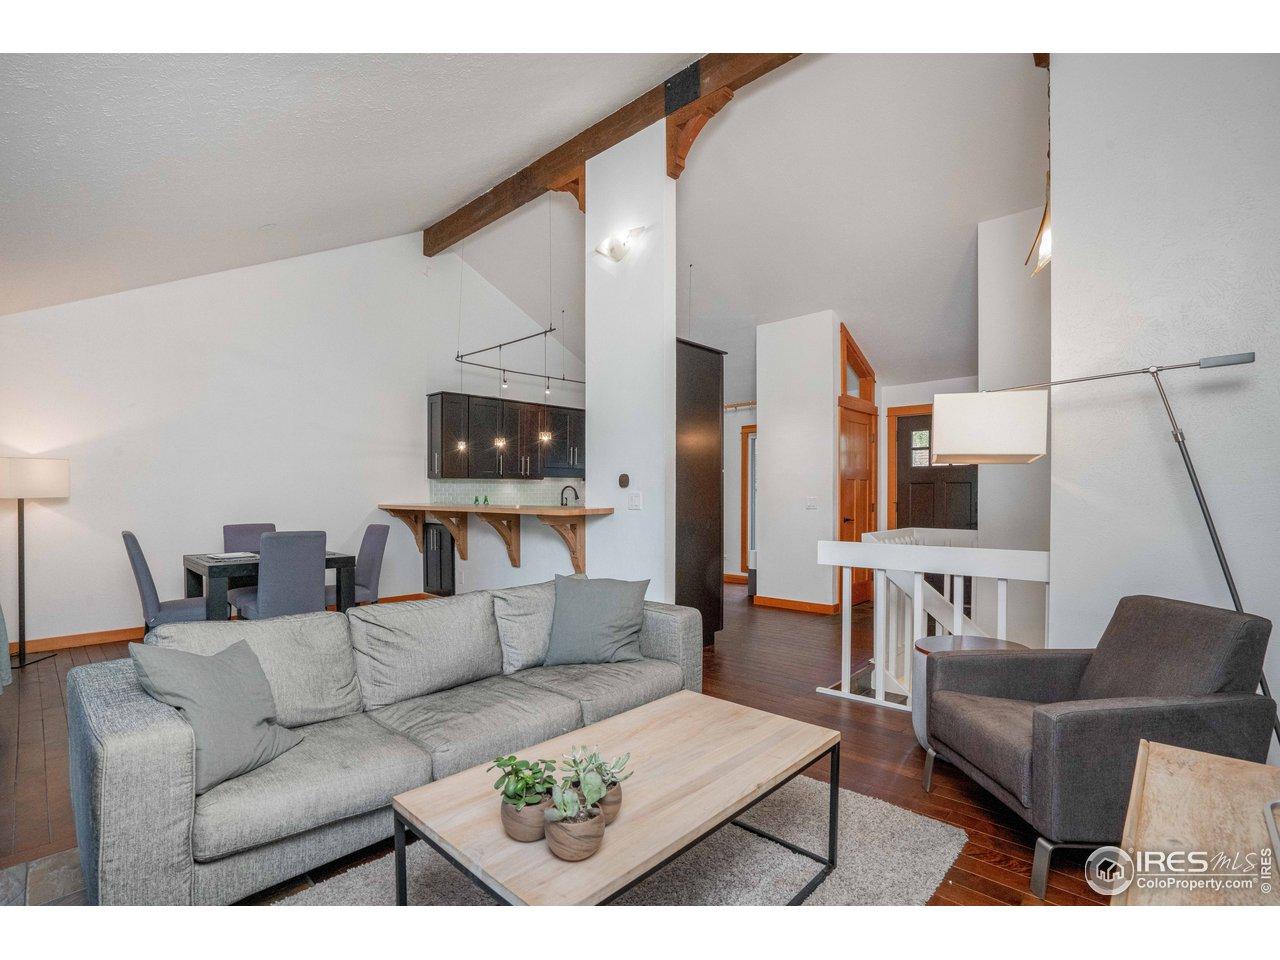 Open Floor Plan with Vaulted Ceilings!